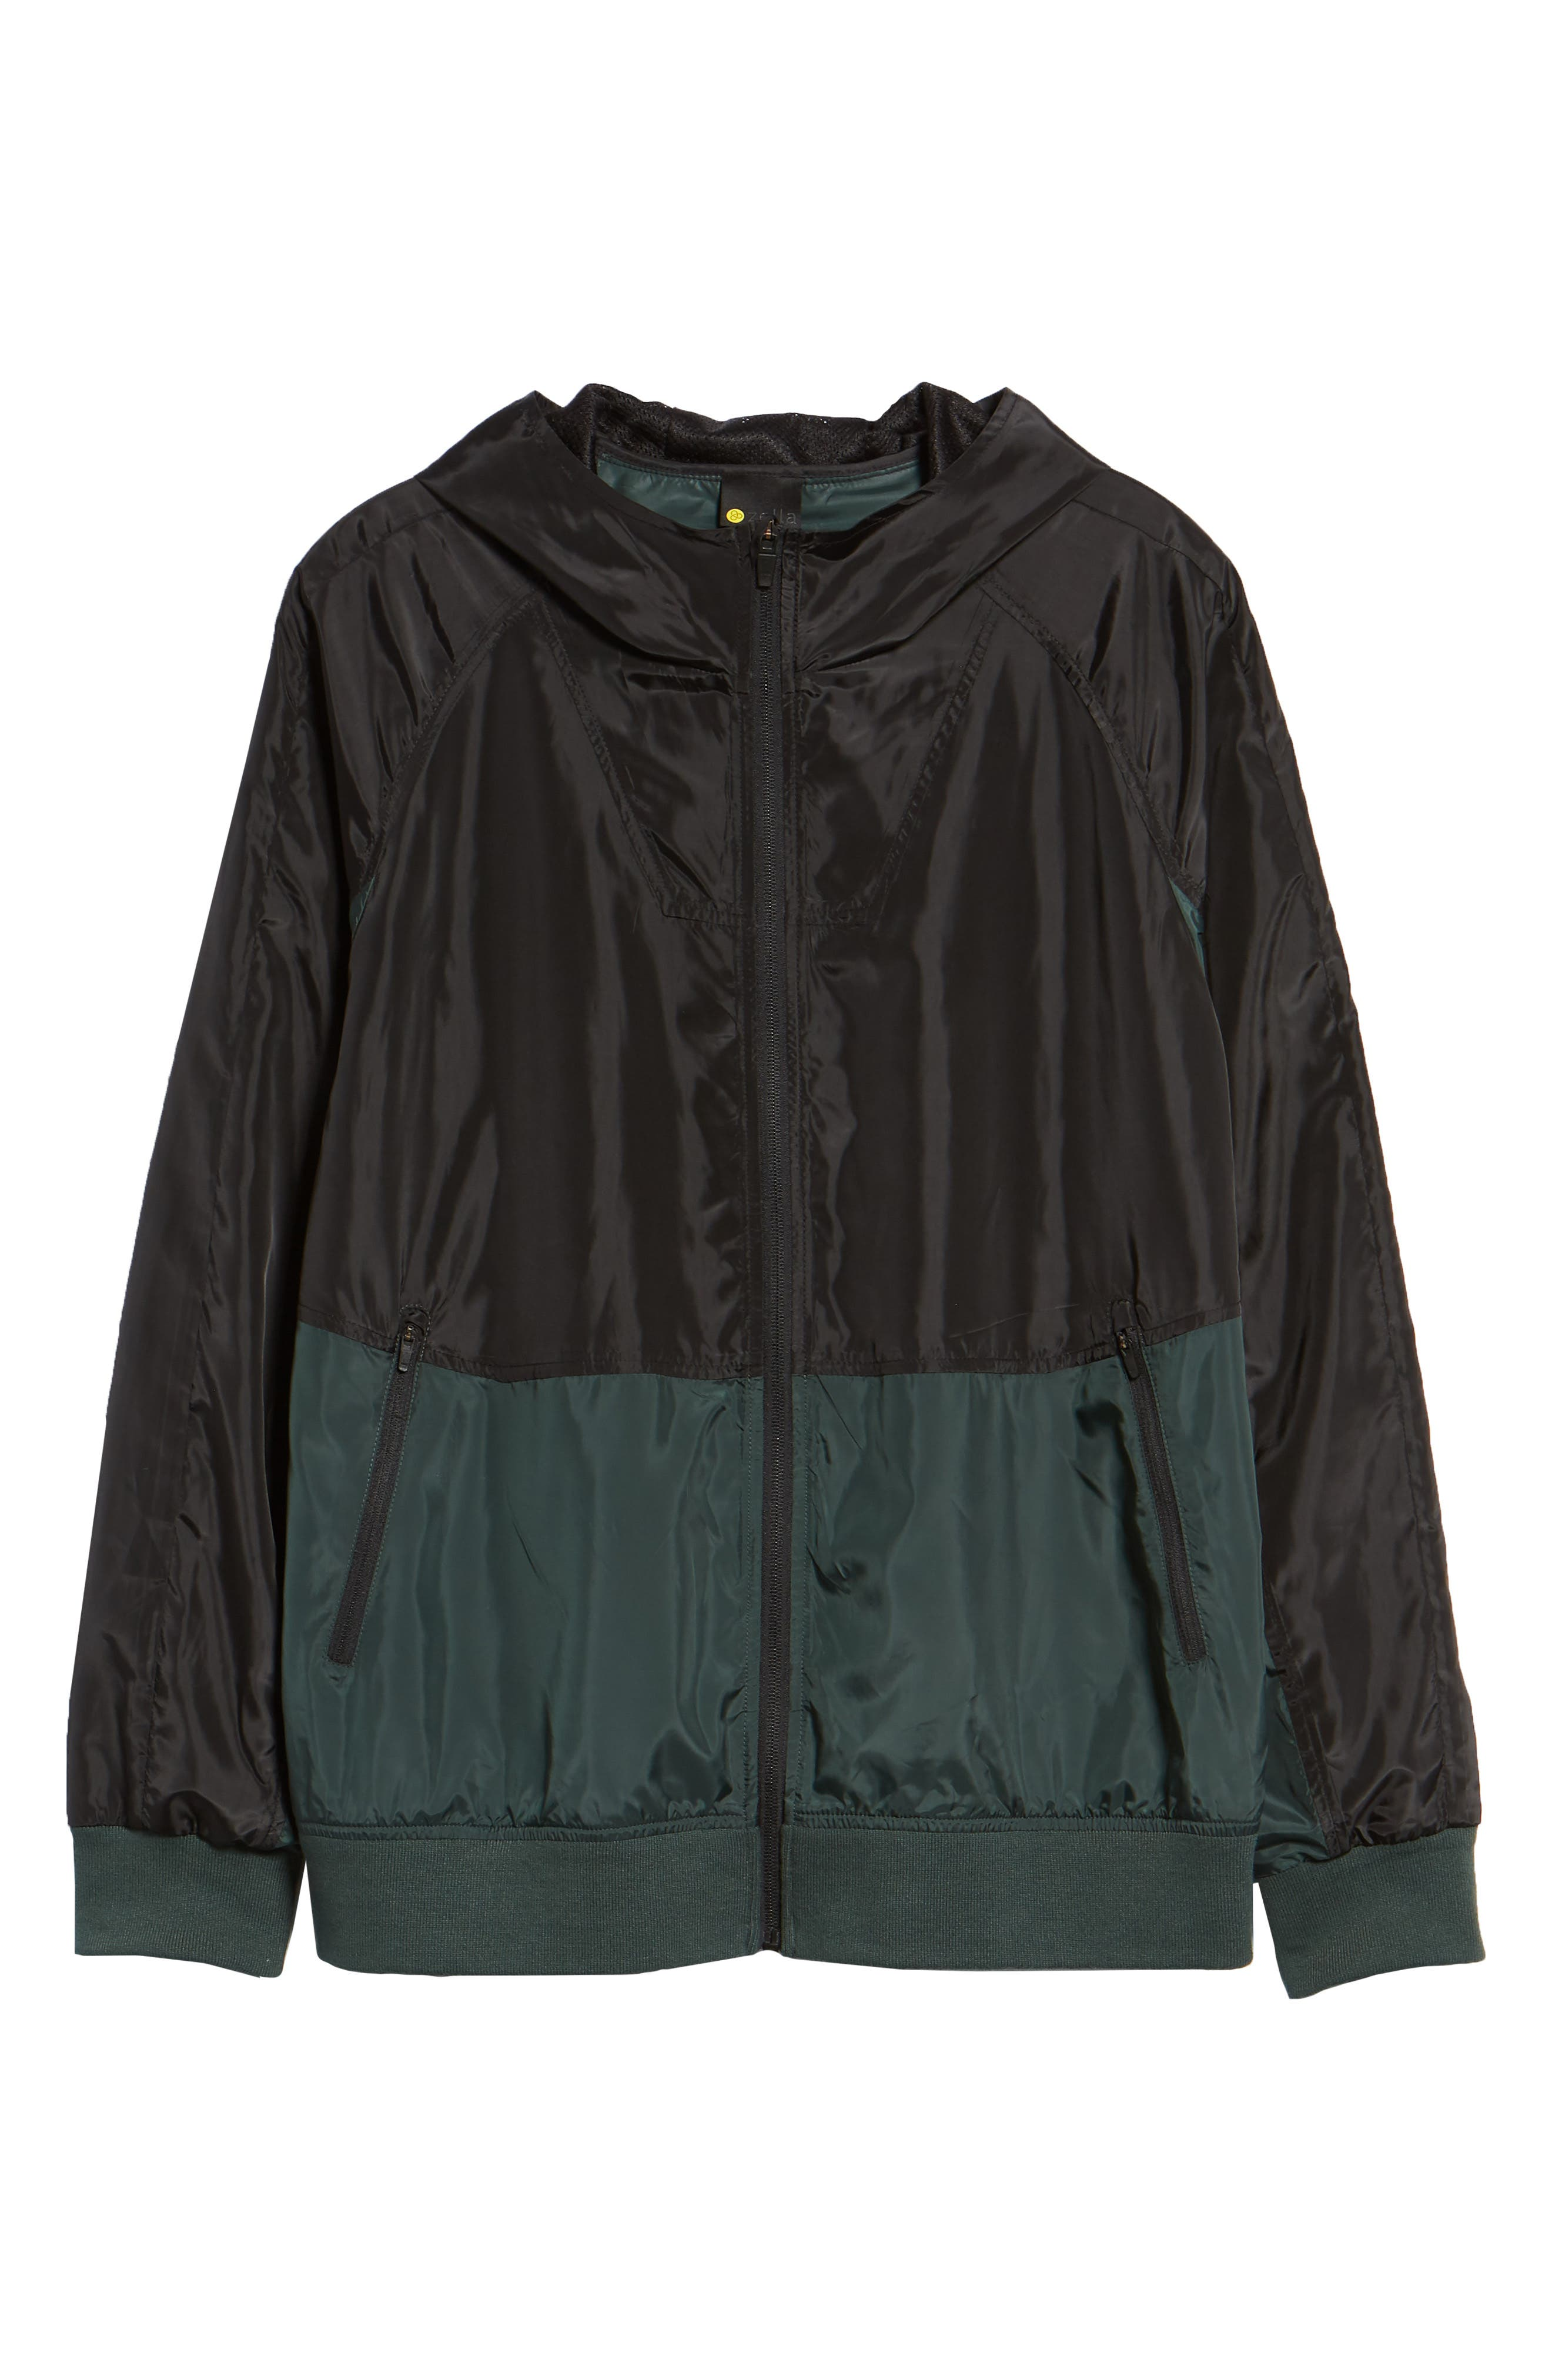 Colorblock Hooded Windbreaker Jacket,                             Alternate thumbnail 6, color,                             BLACK GREEN ODINITE